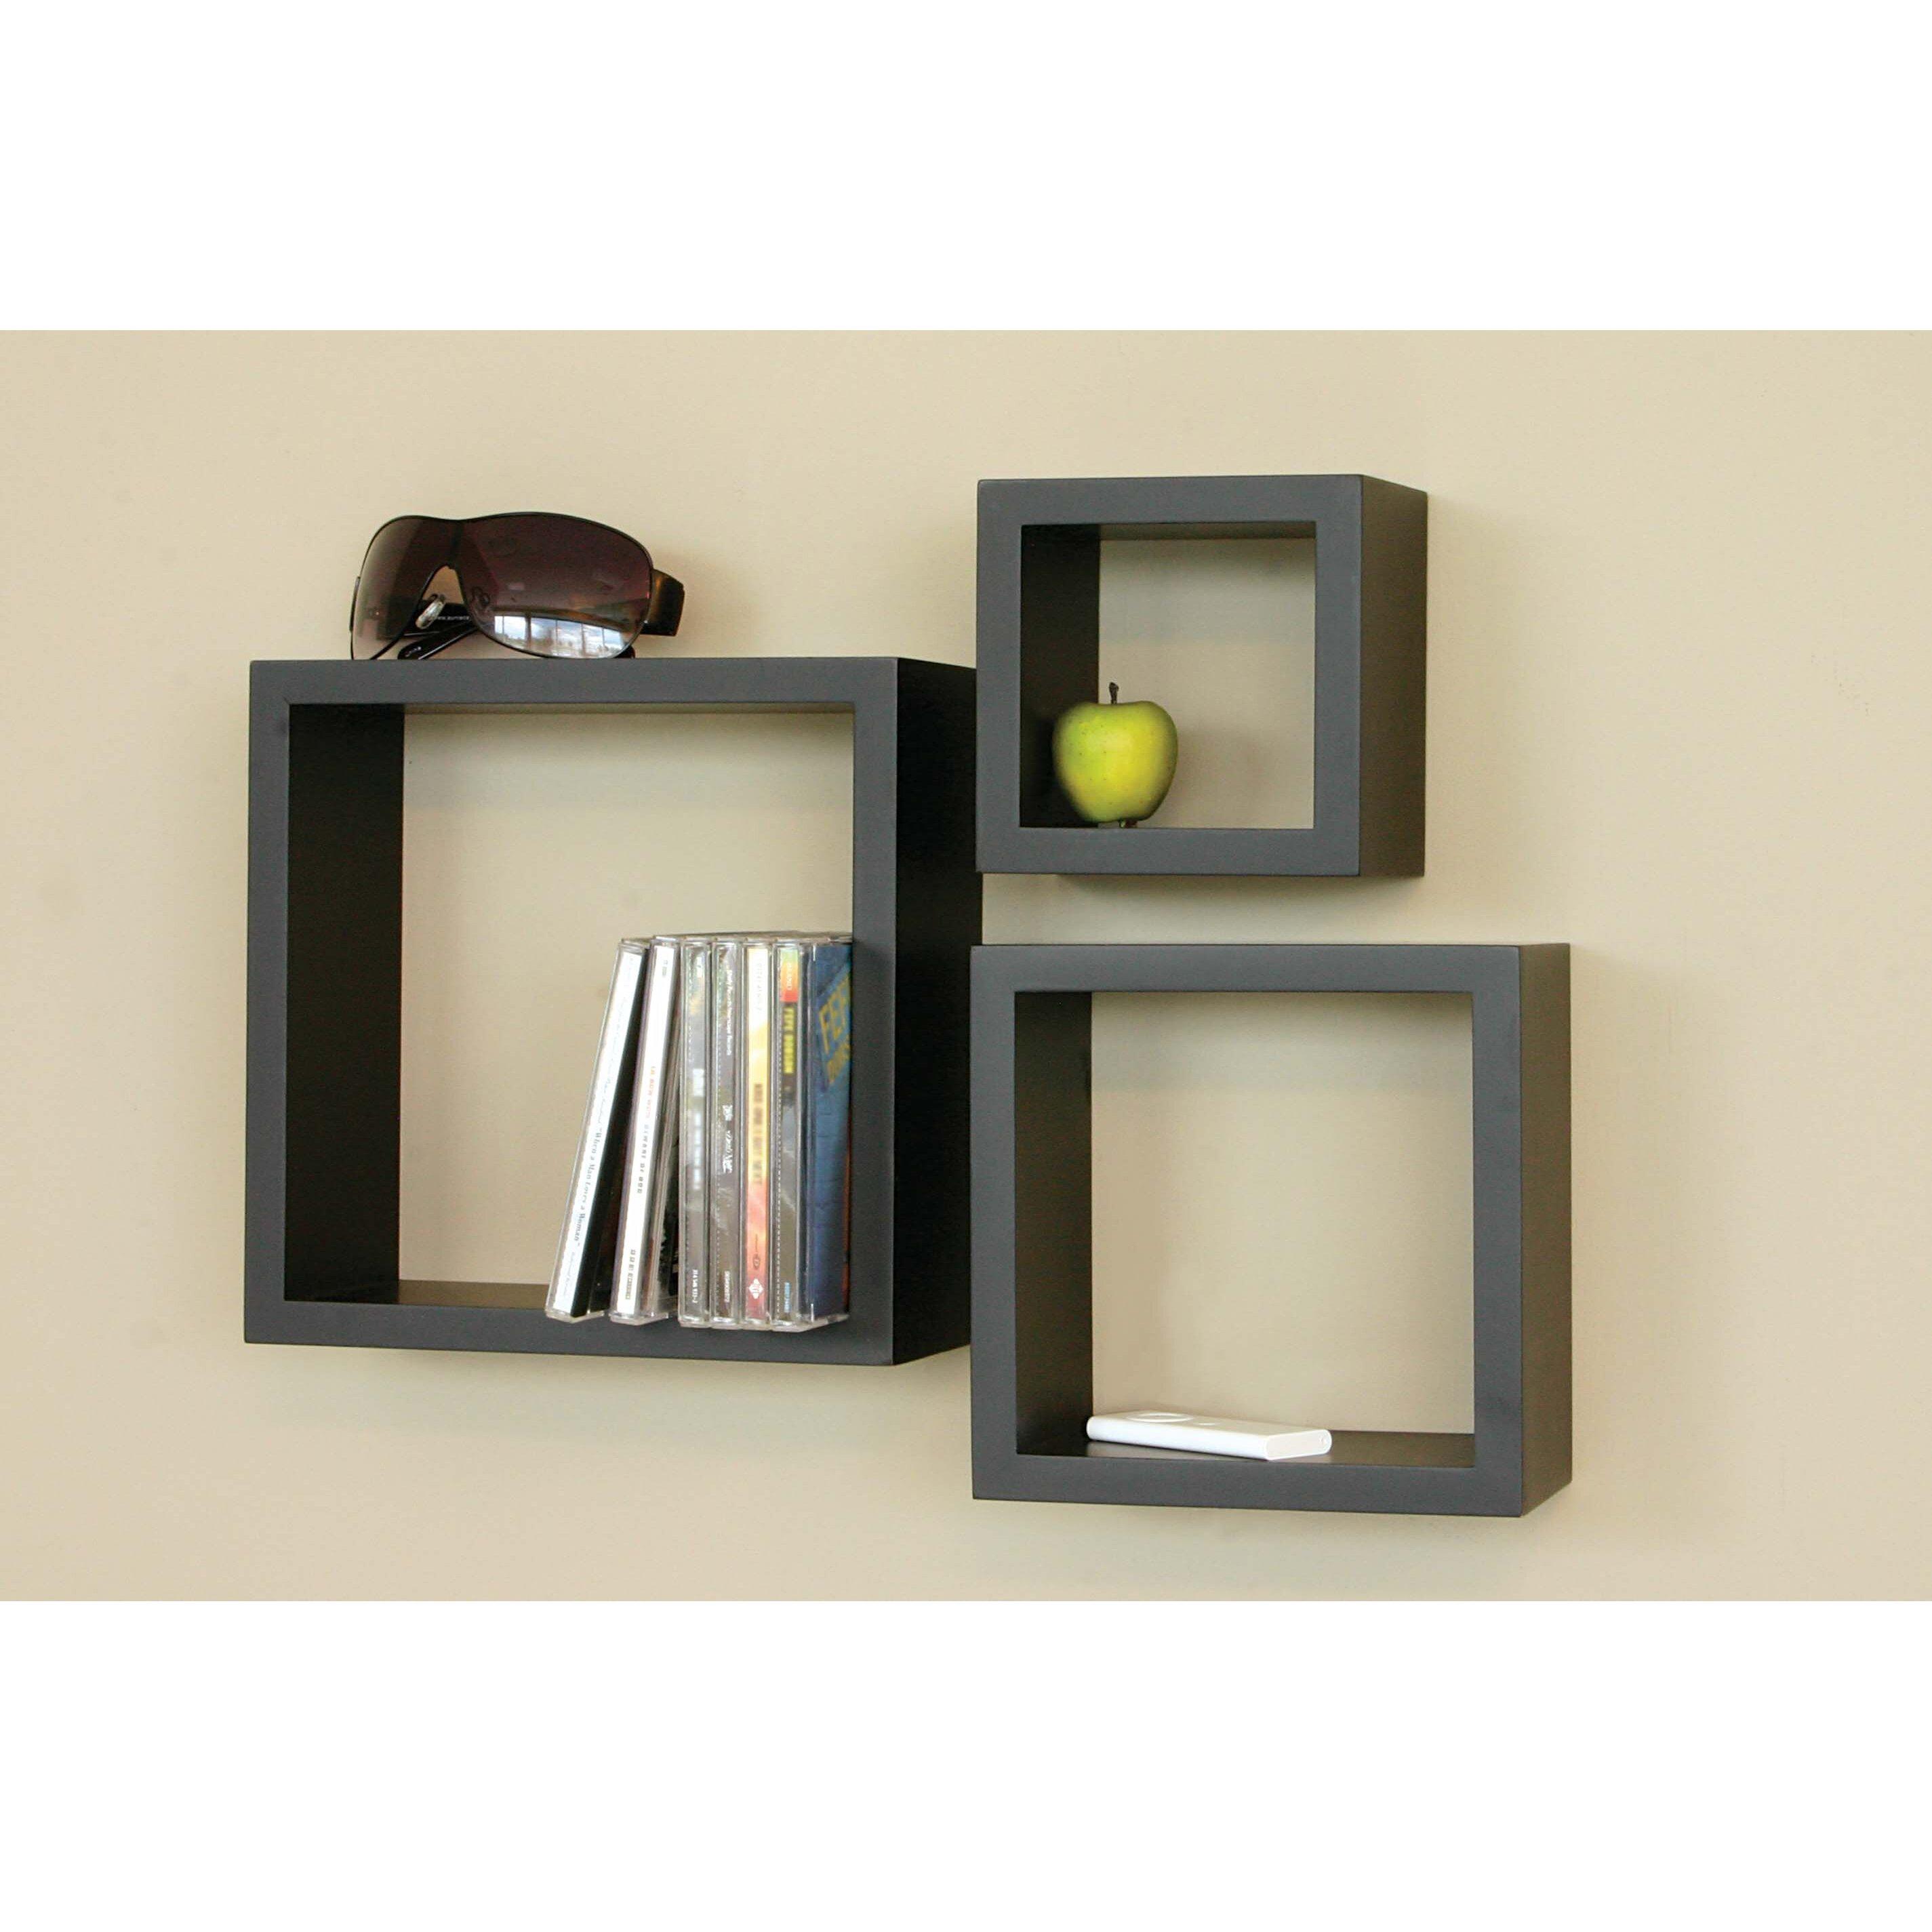 Nexxt design cubbi 3 piece wall shelf set reviews wayfair for Rack design for bedroom